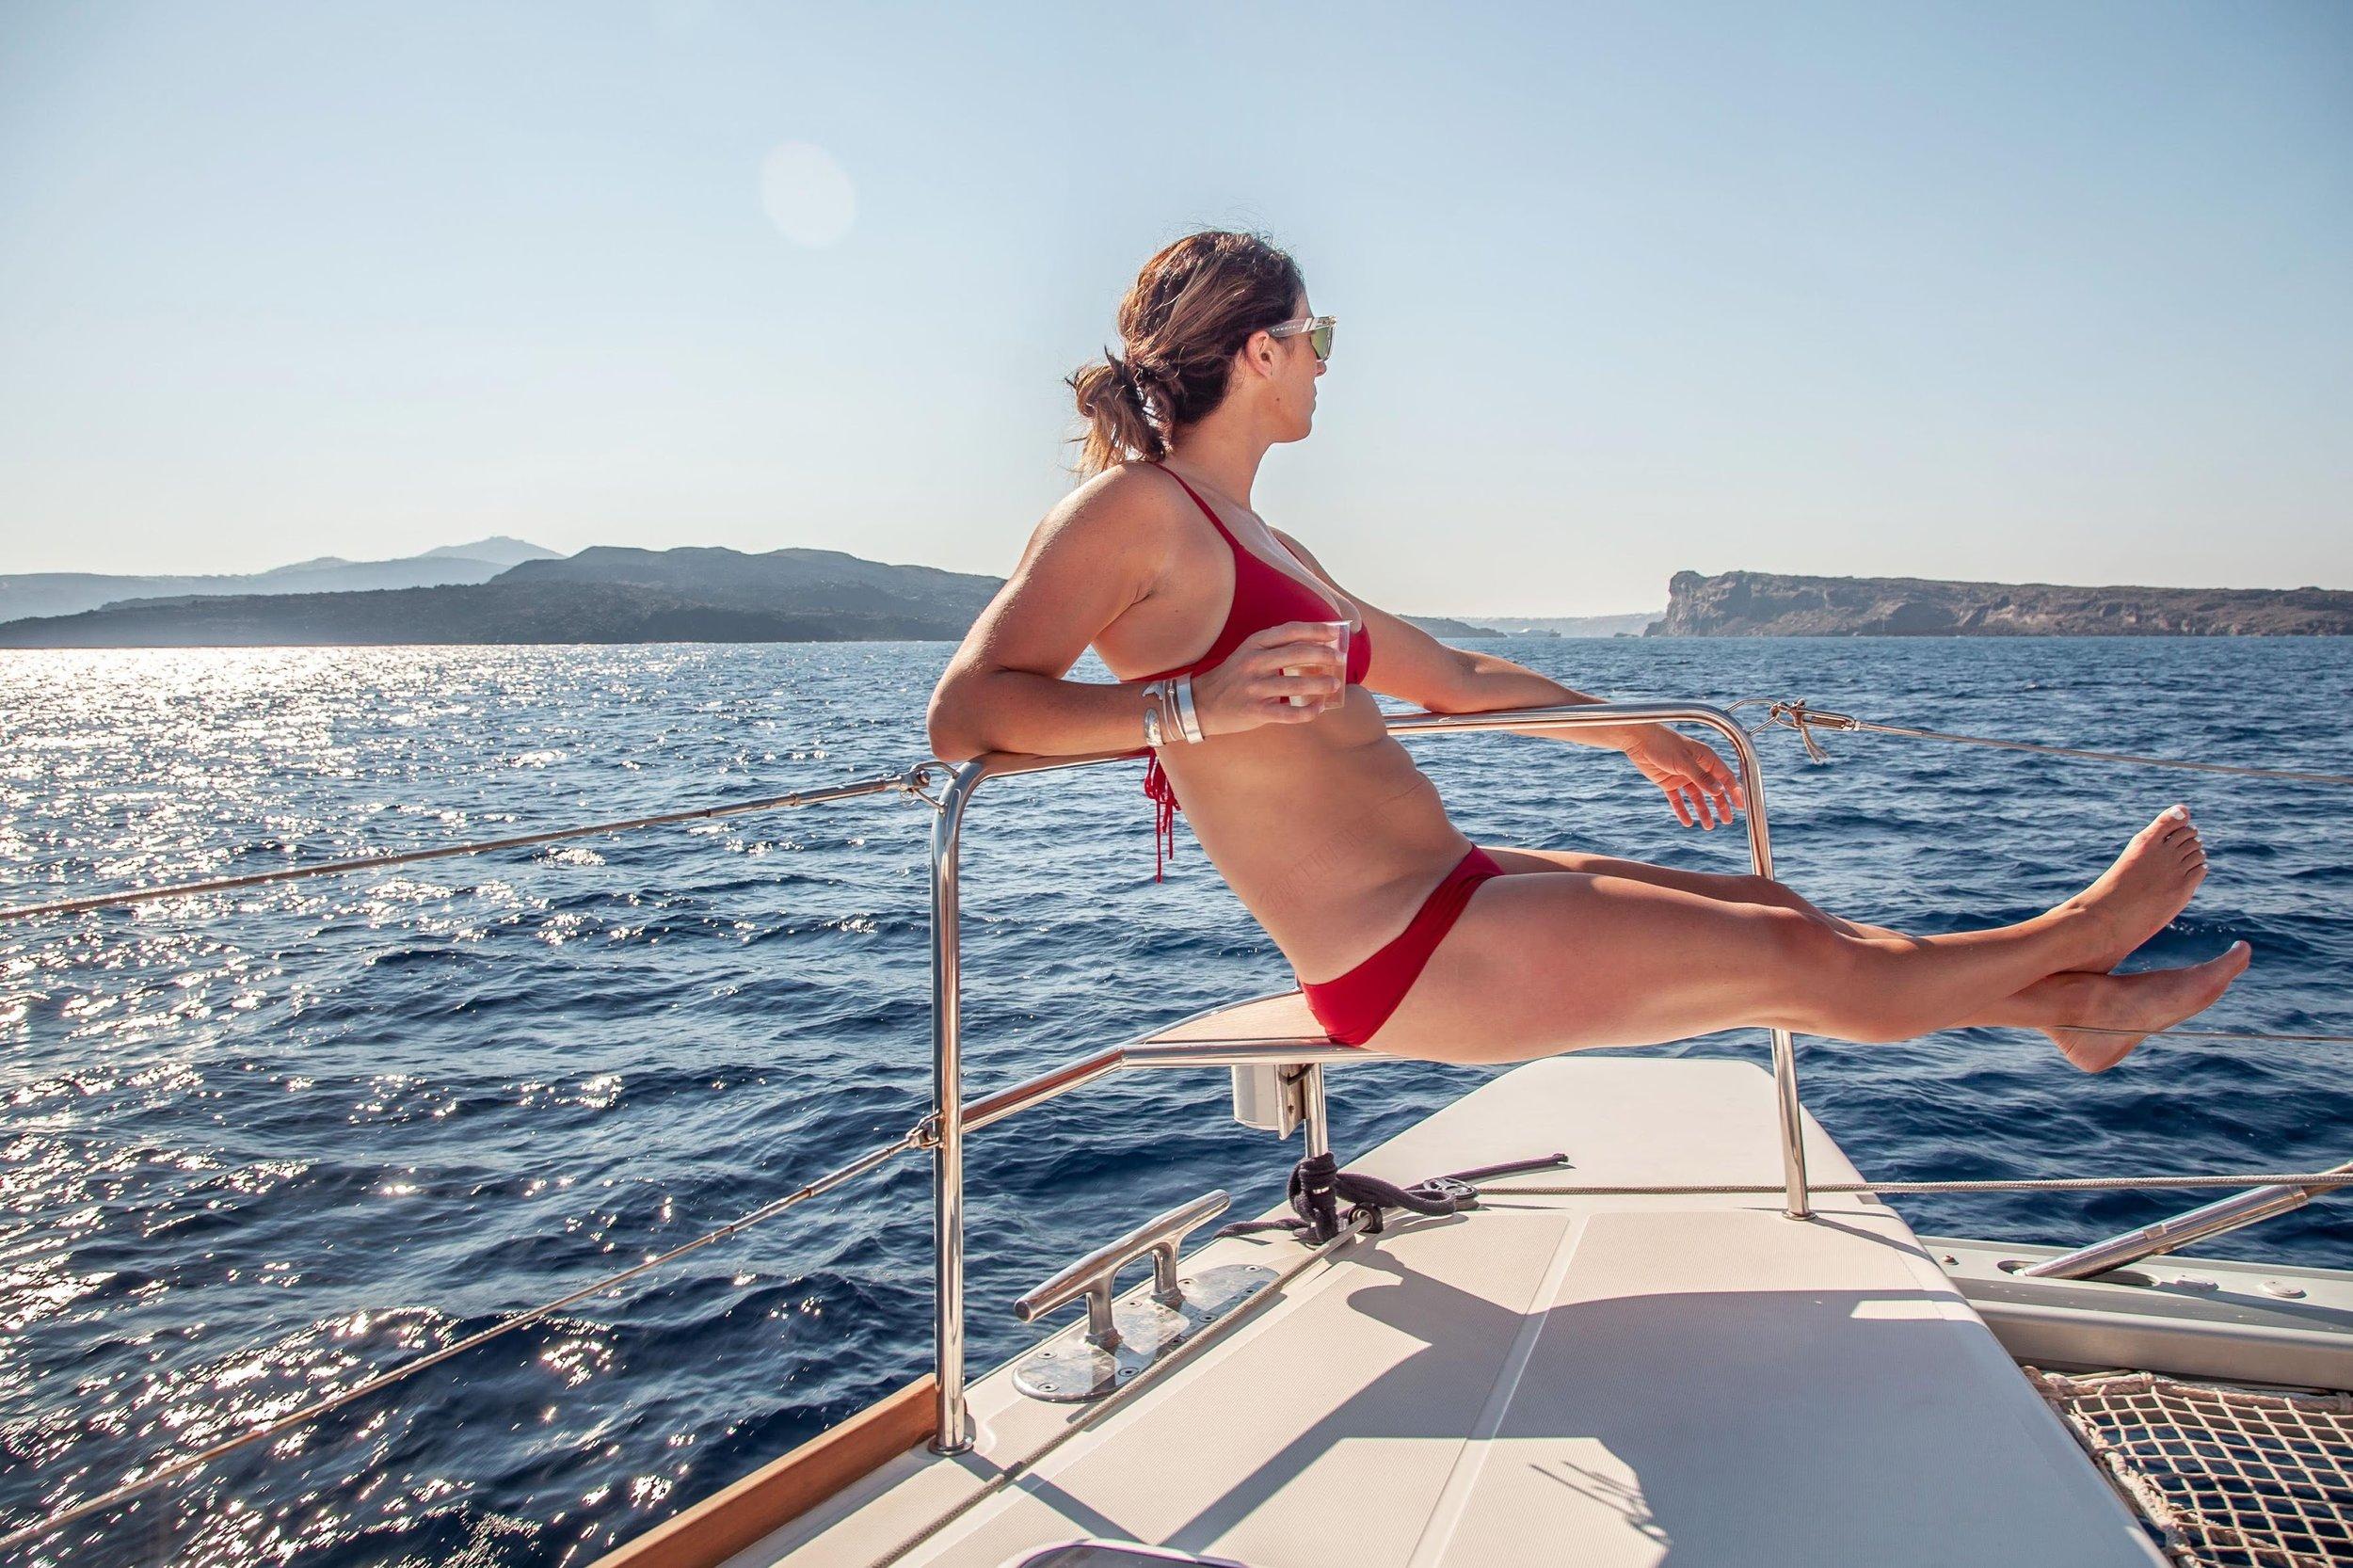 greece travel fitness tour voyedge rx crossfit travel